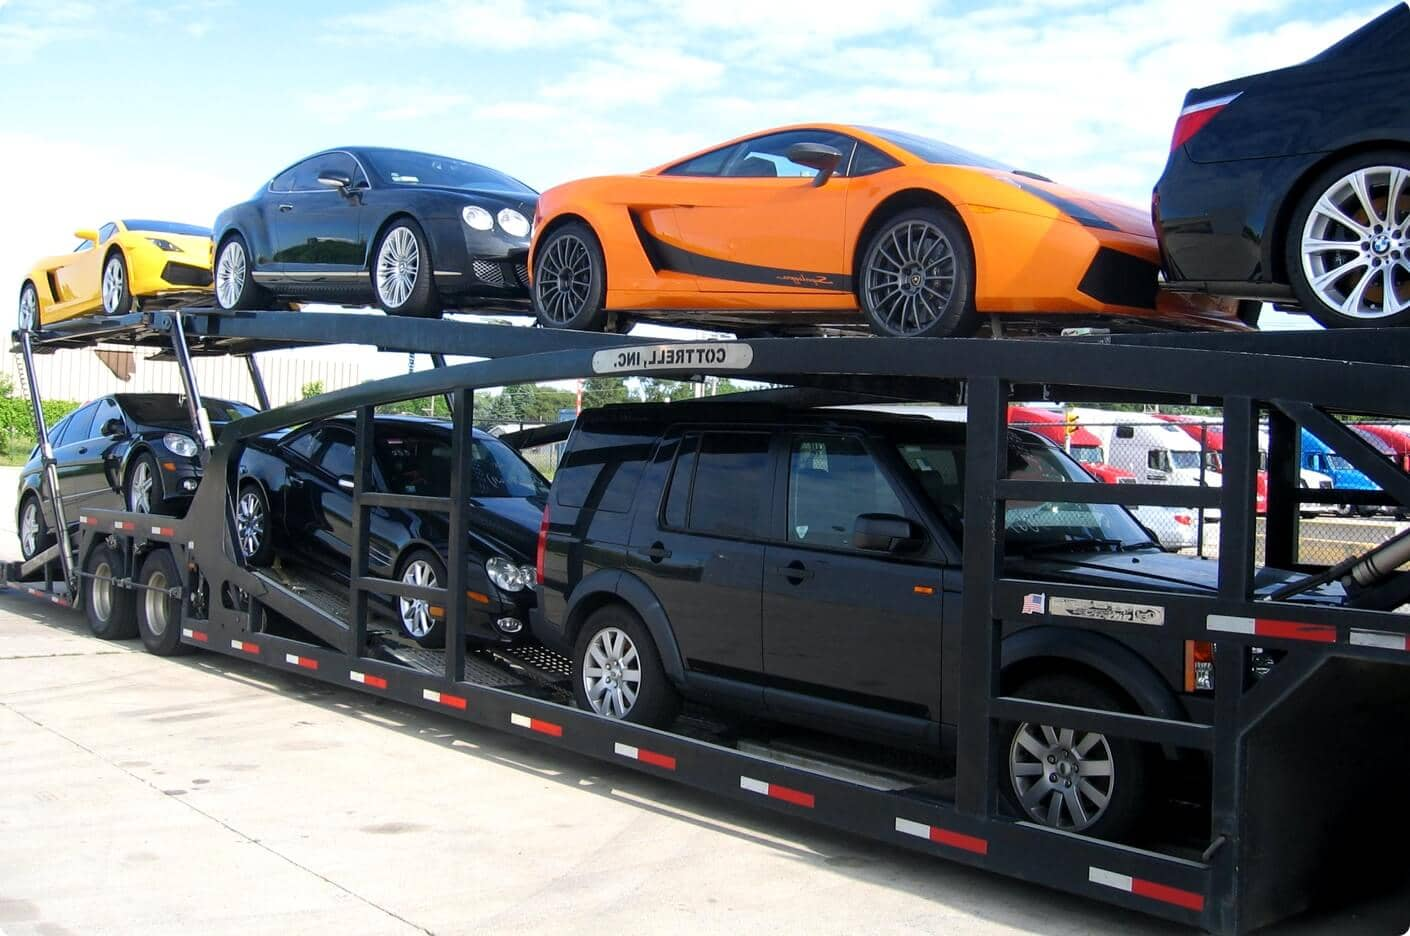 Best Auto Transport Service in America